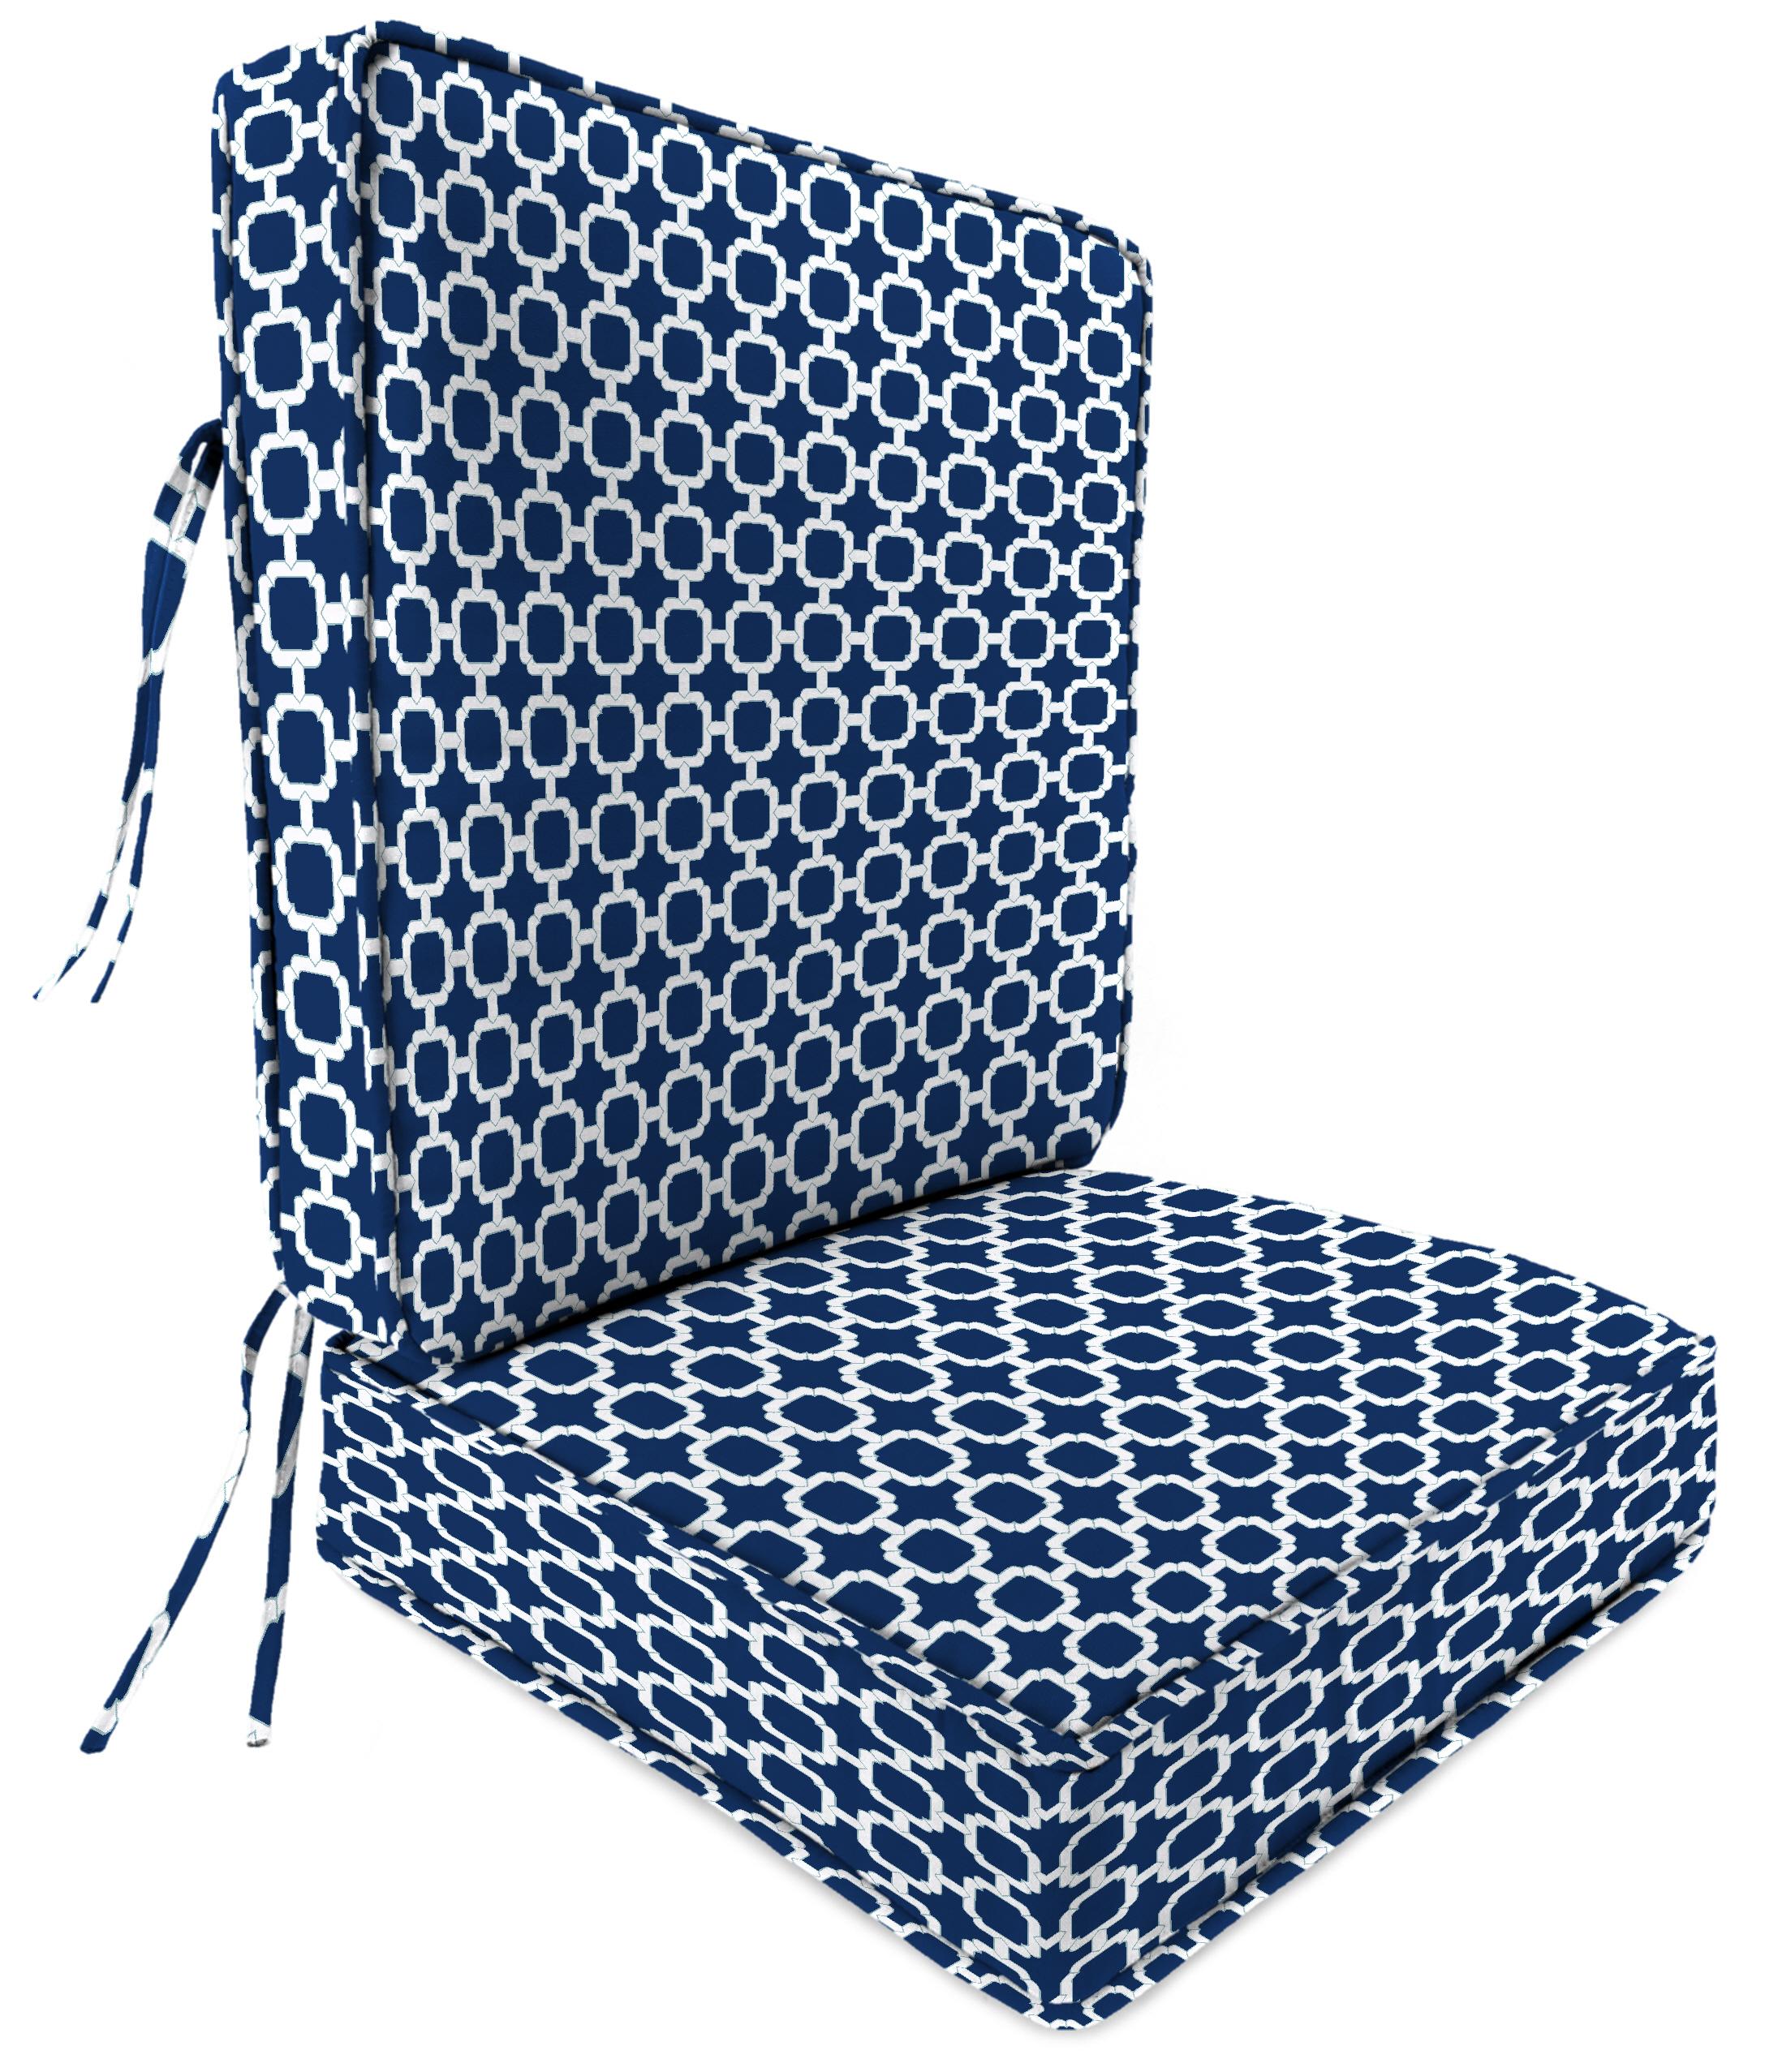 Jordan Manufacturing Co., Inc. Patio Deep Seat Patio Chair Cushion in Hockley Navy